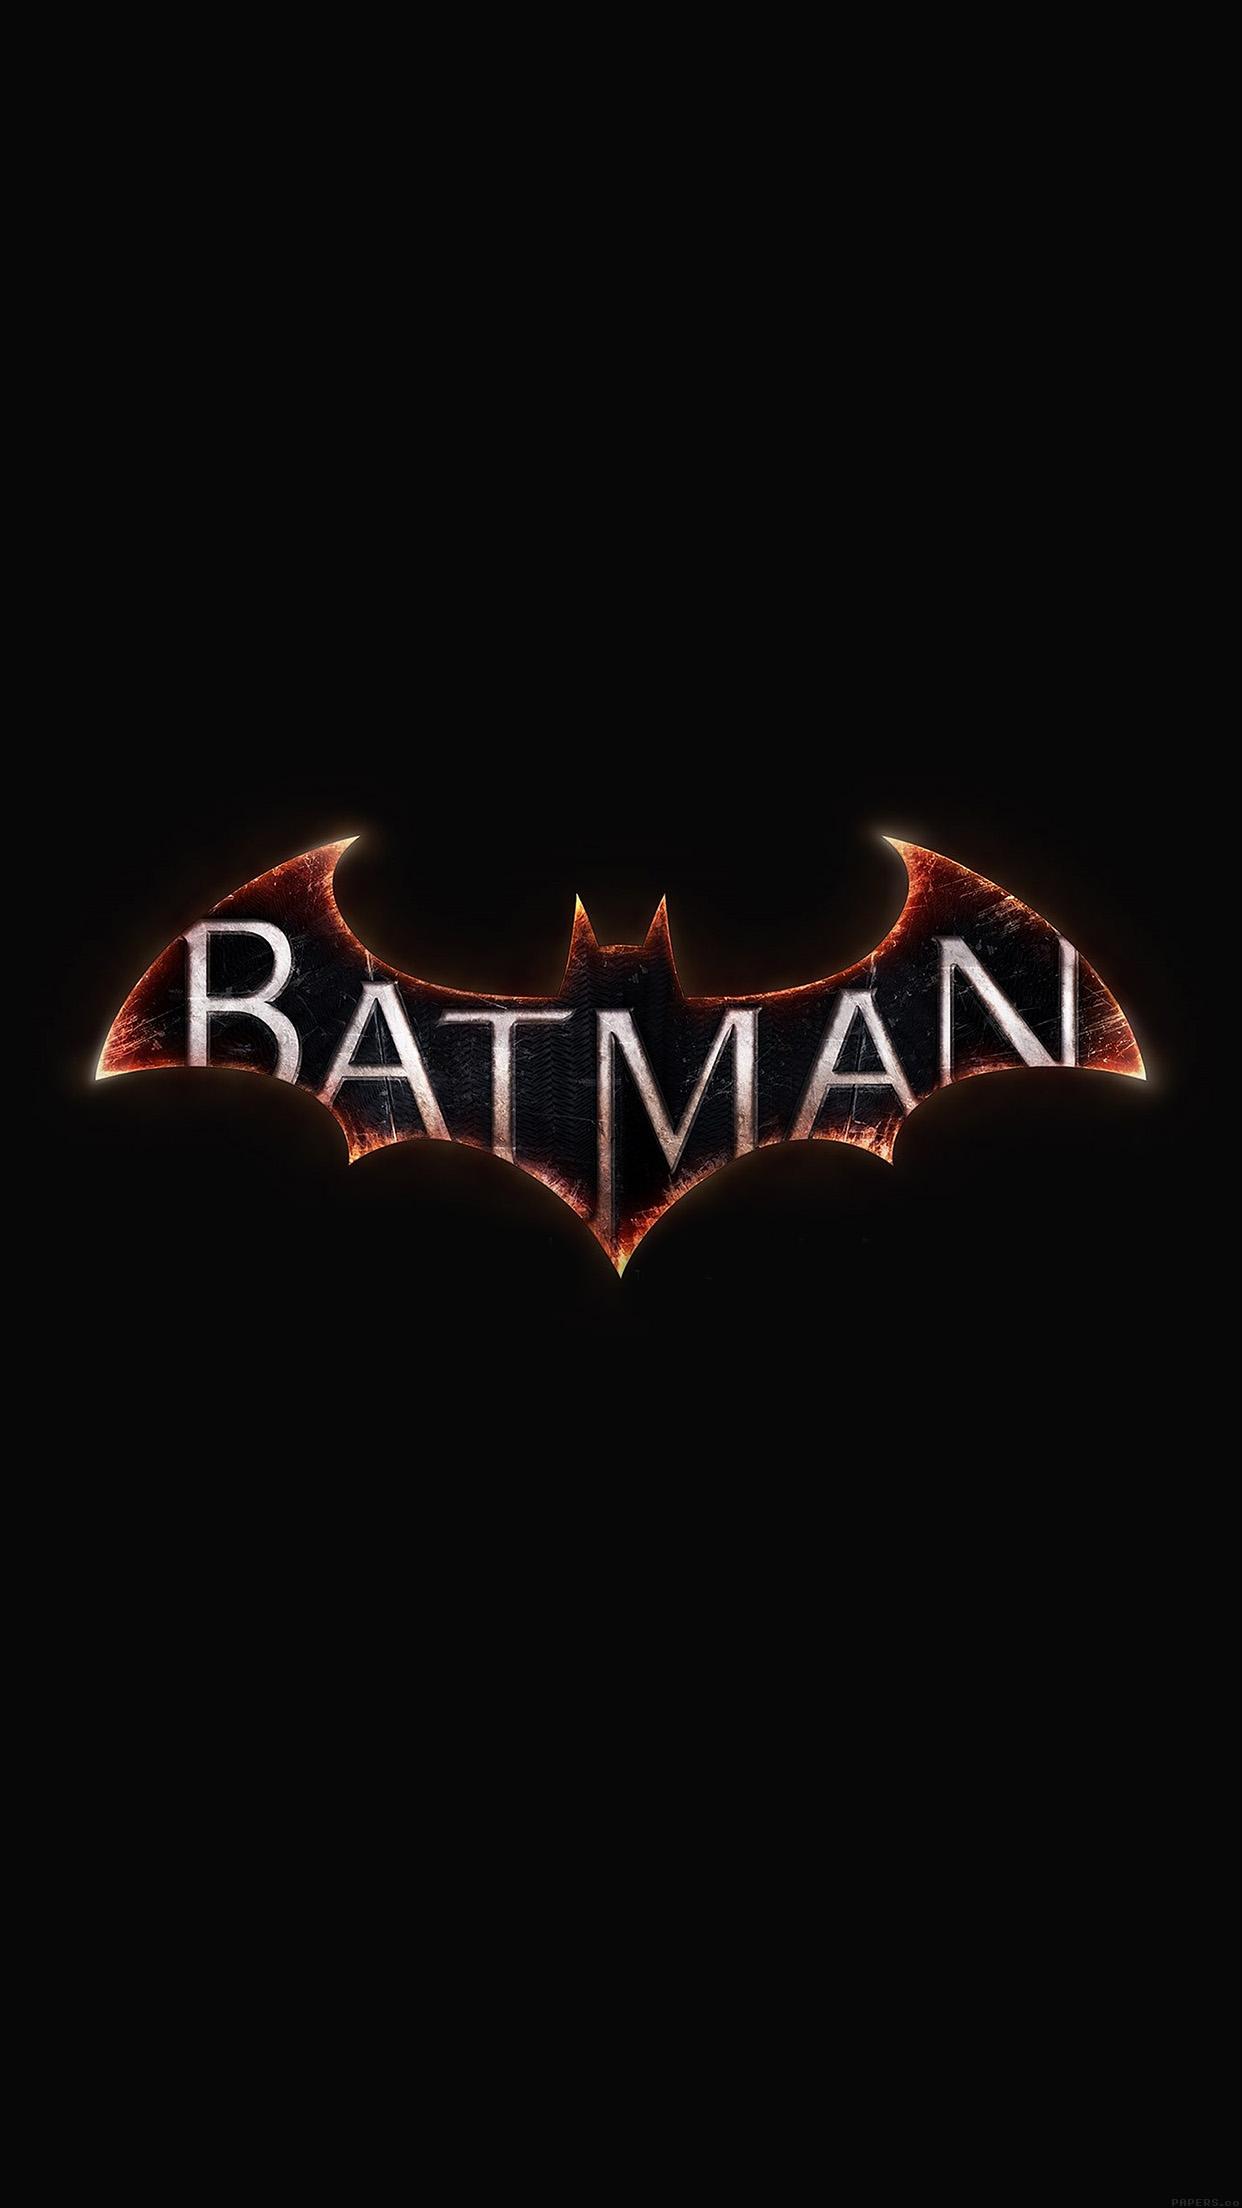 Iphone6papers Ag60 Batman Arkham Knight Hero Art